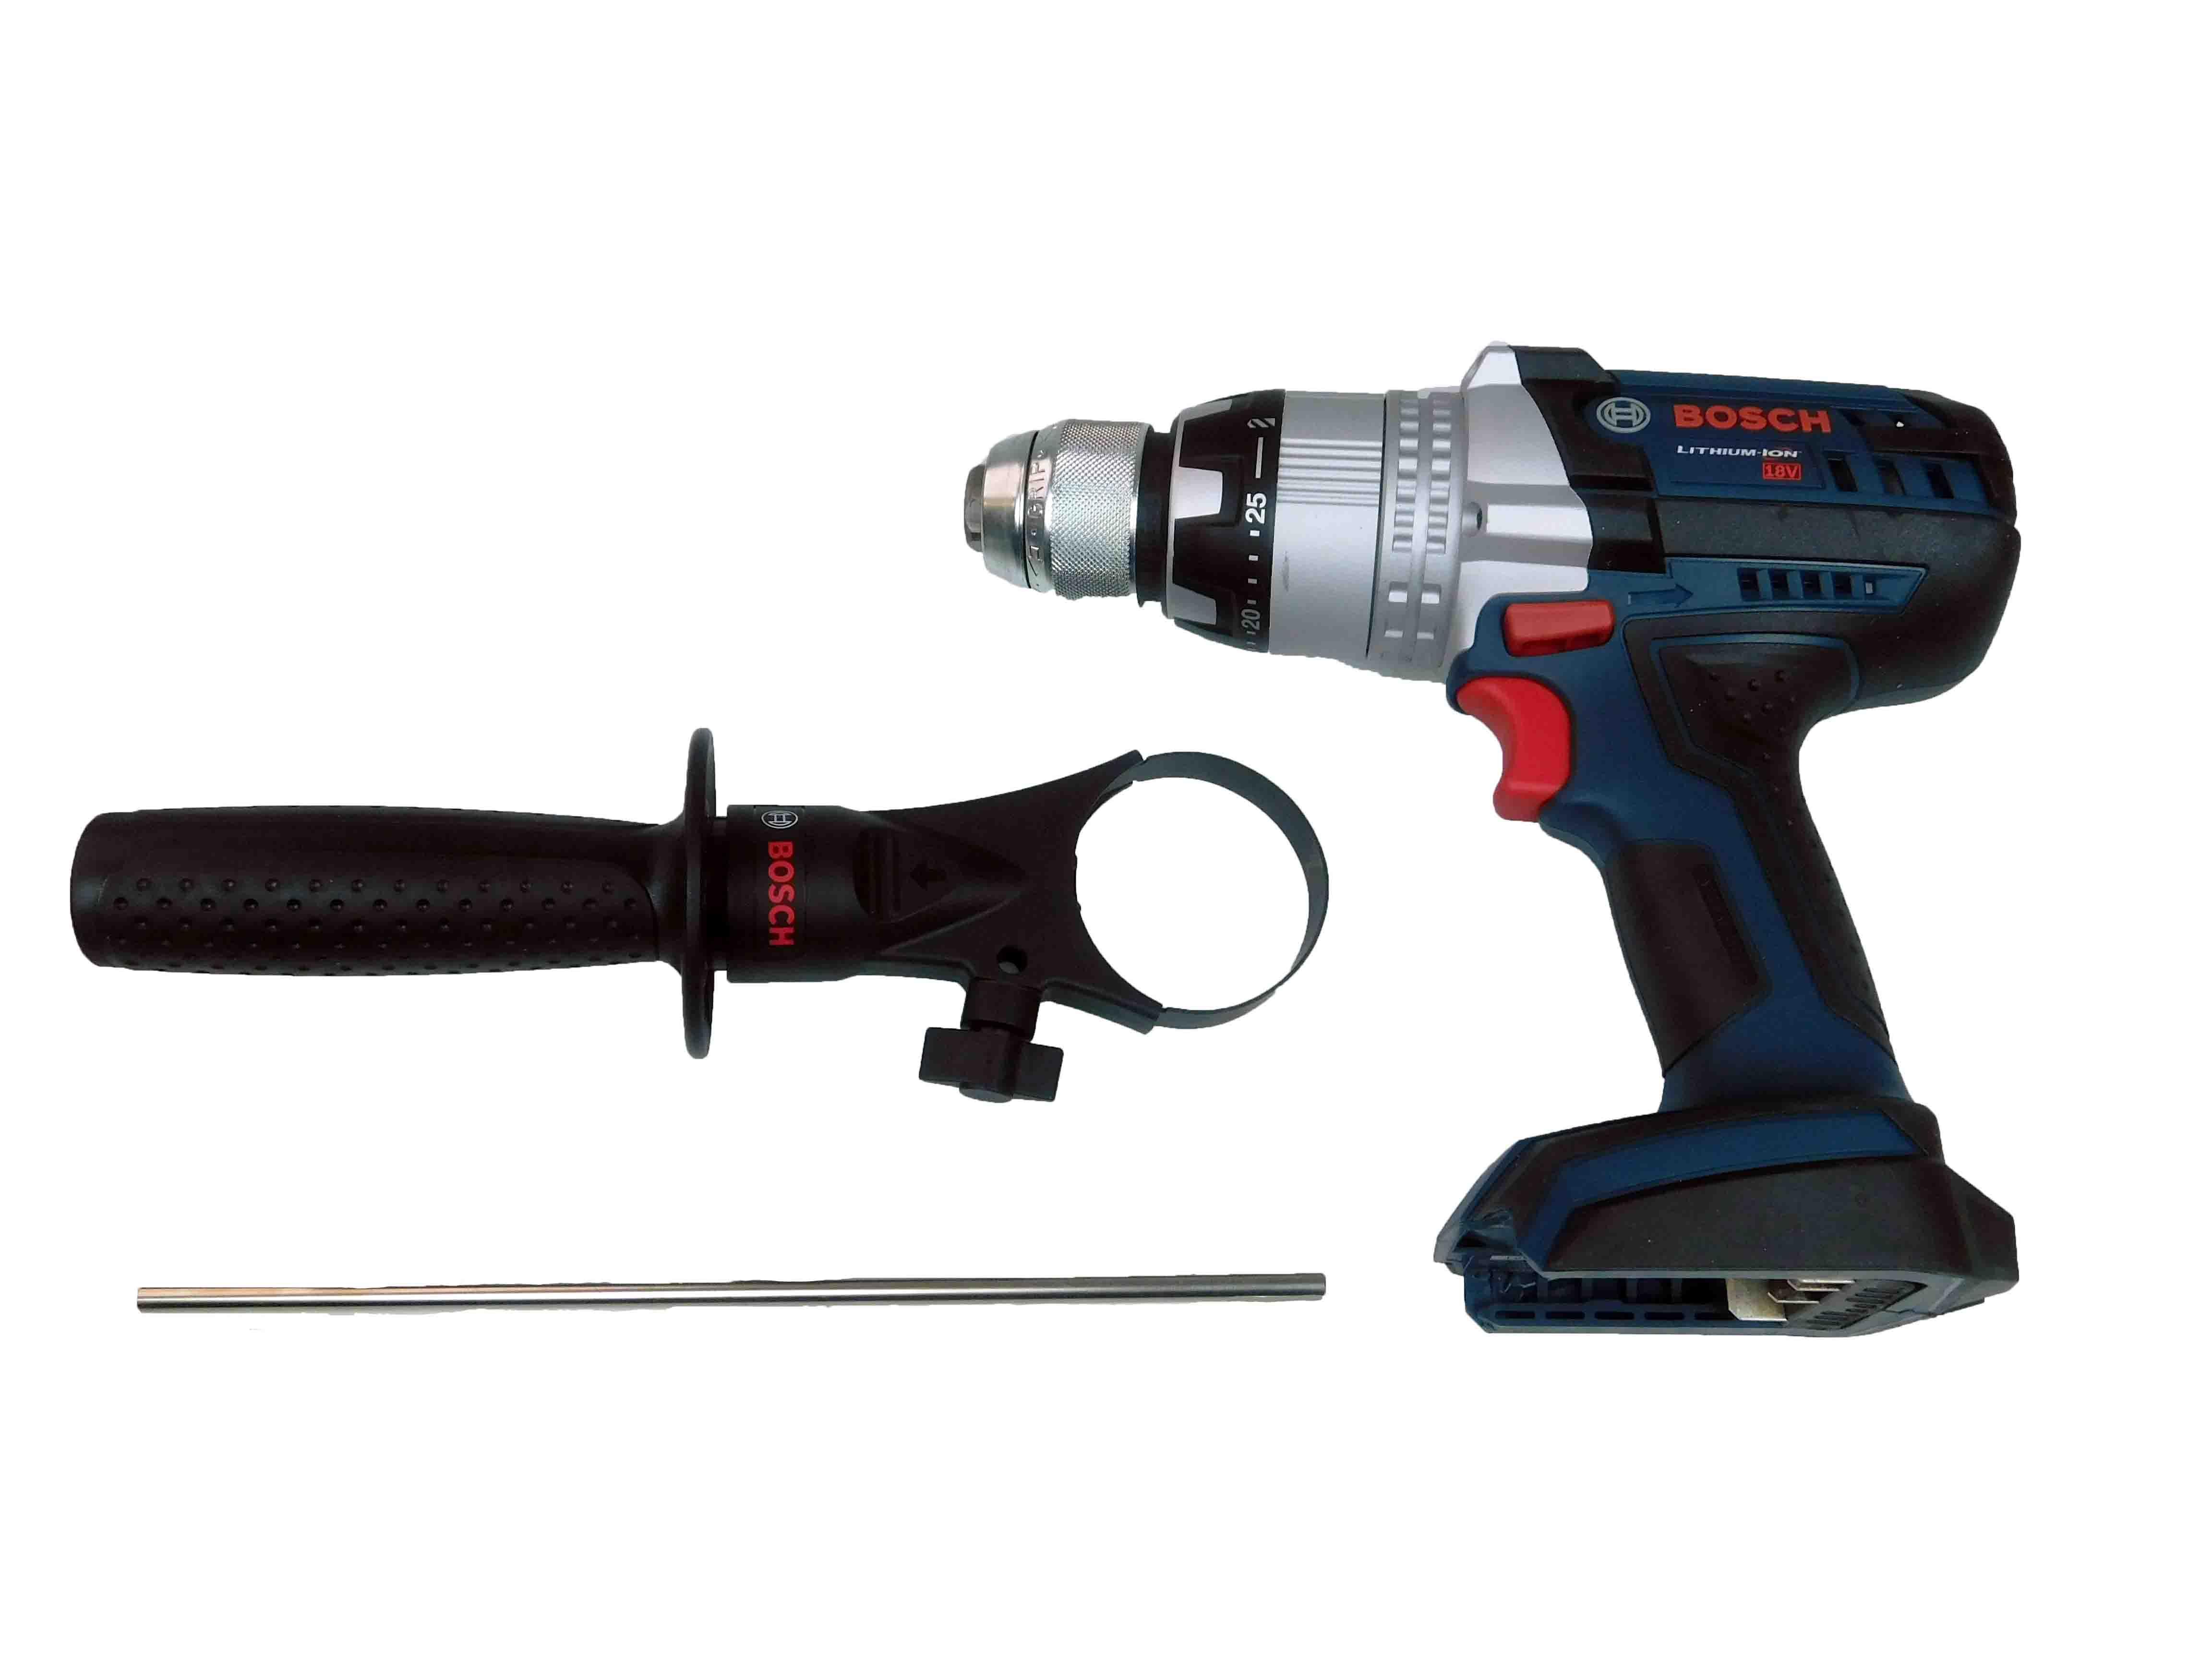 Bosch-HDH181XB18V-Brute-Tough-1-2-In.-Hammer-Drill-Driver-image-2